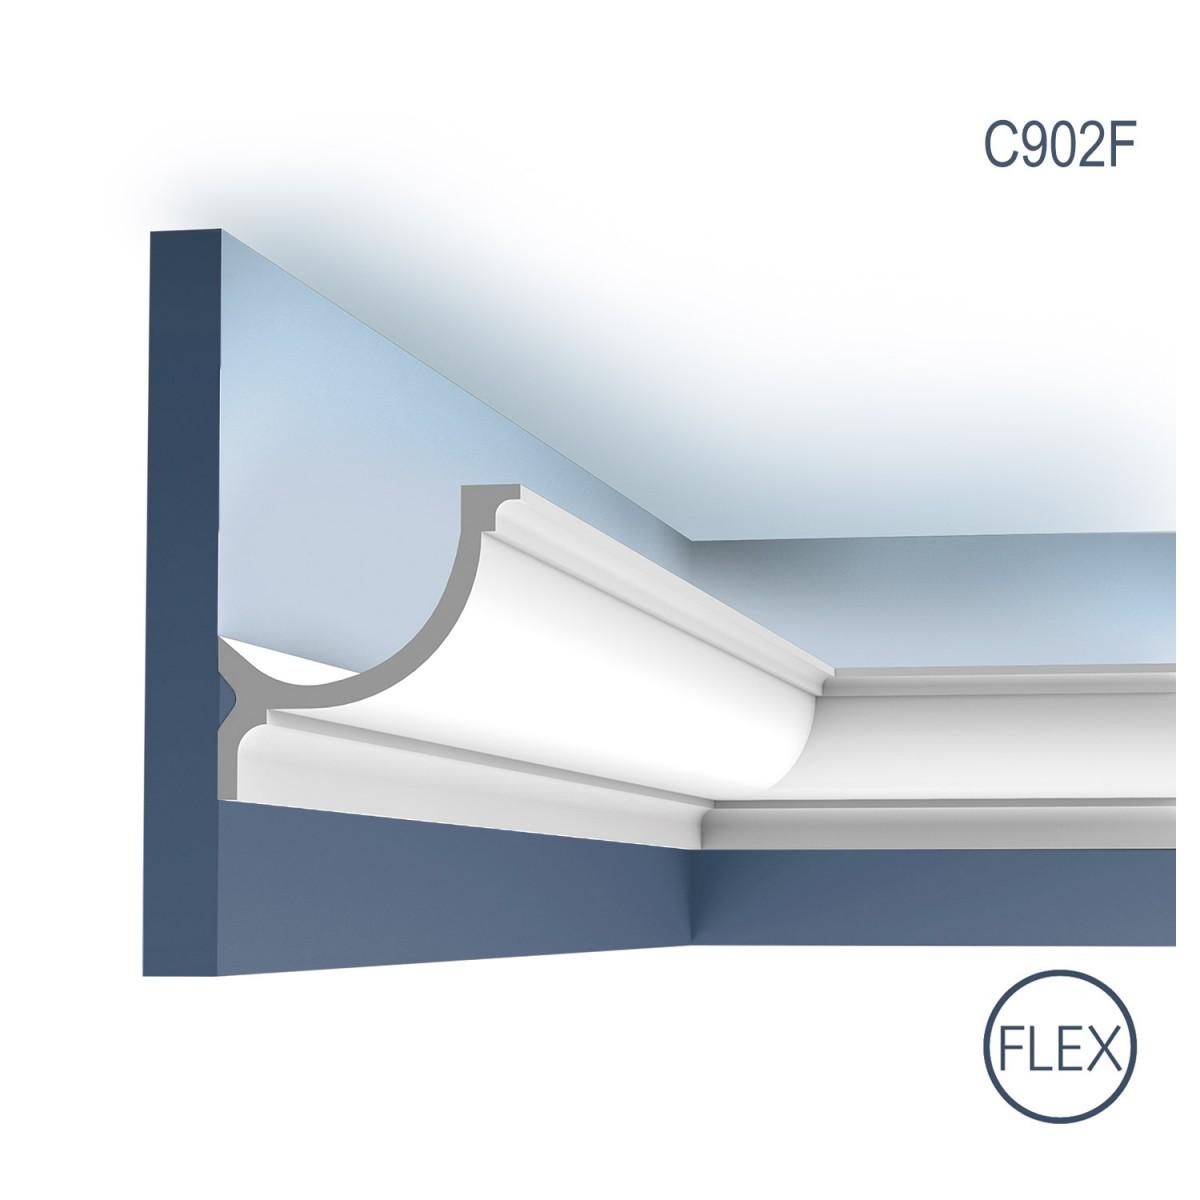 Scafa Flex Luxxus C902F, Dimensiuni: 200 X 10.3 X 10.3 cm, Orac Decor